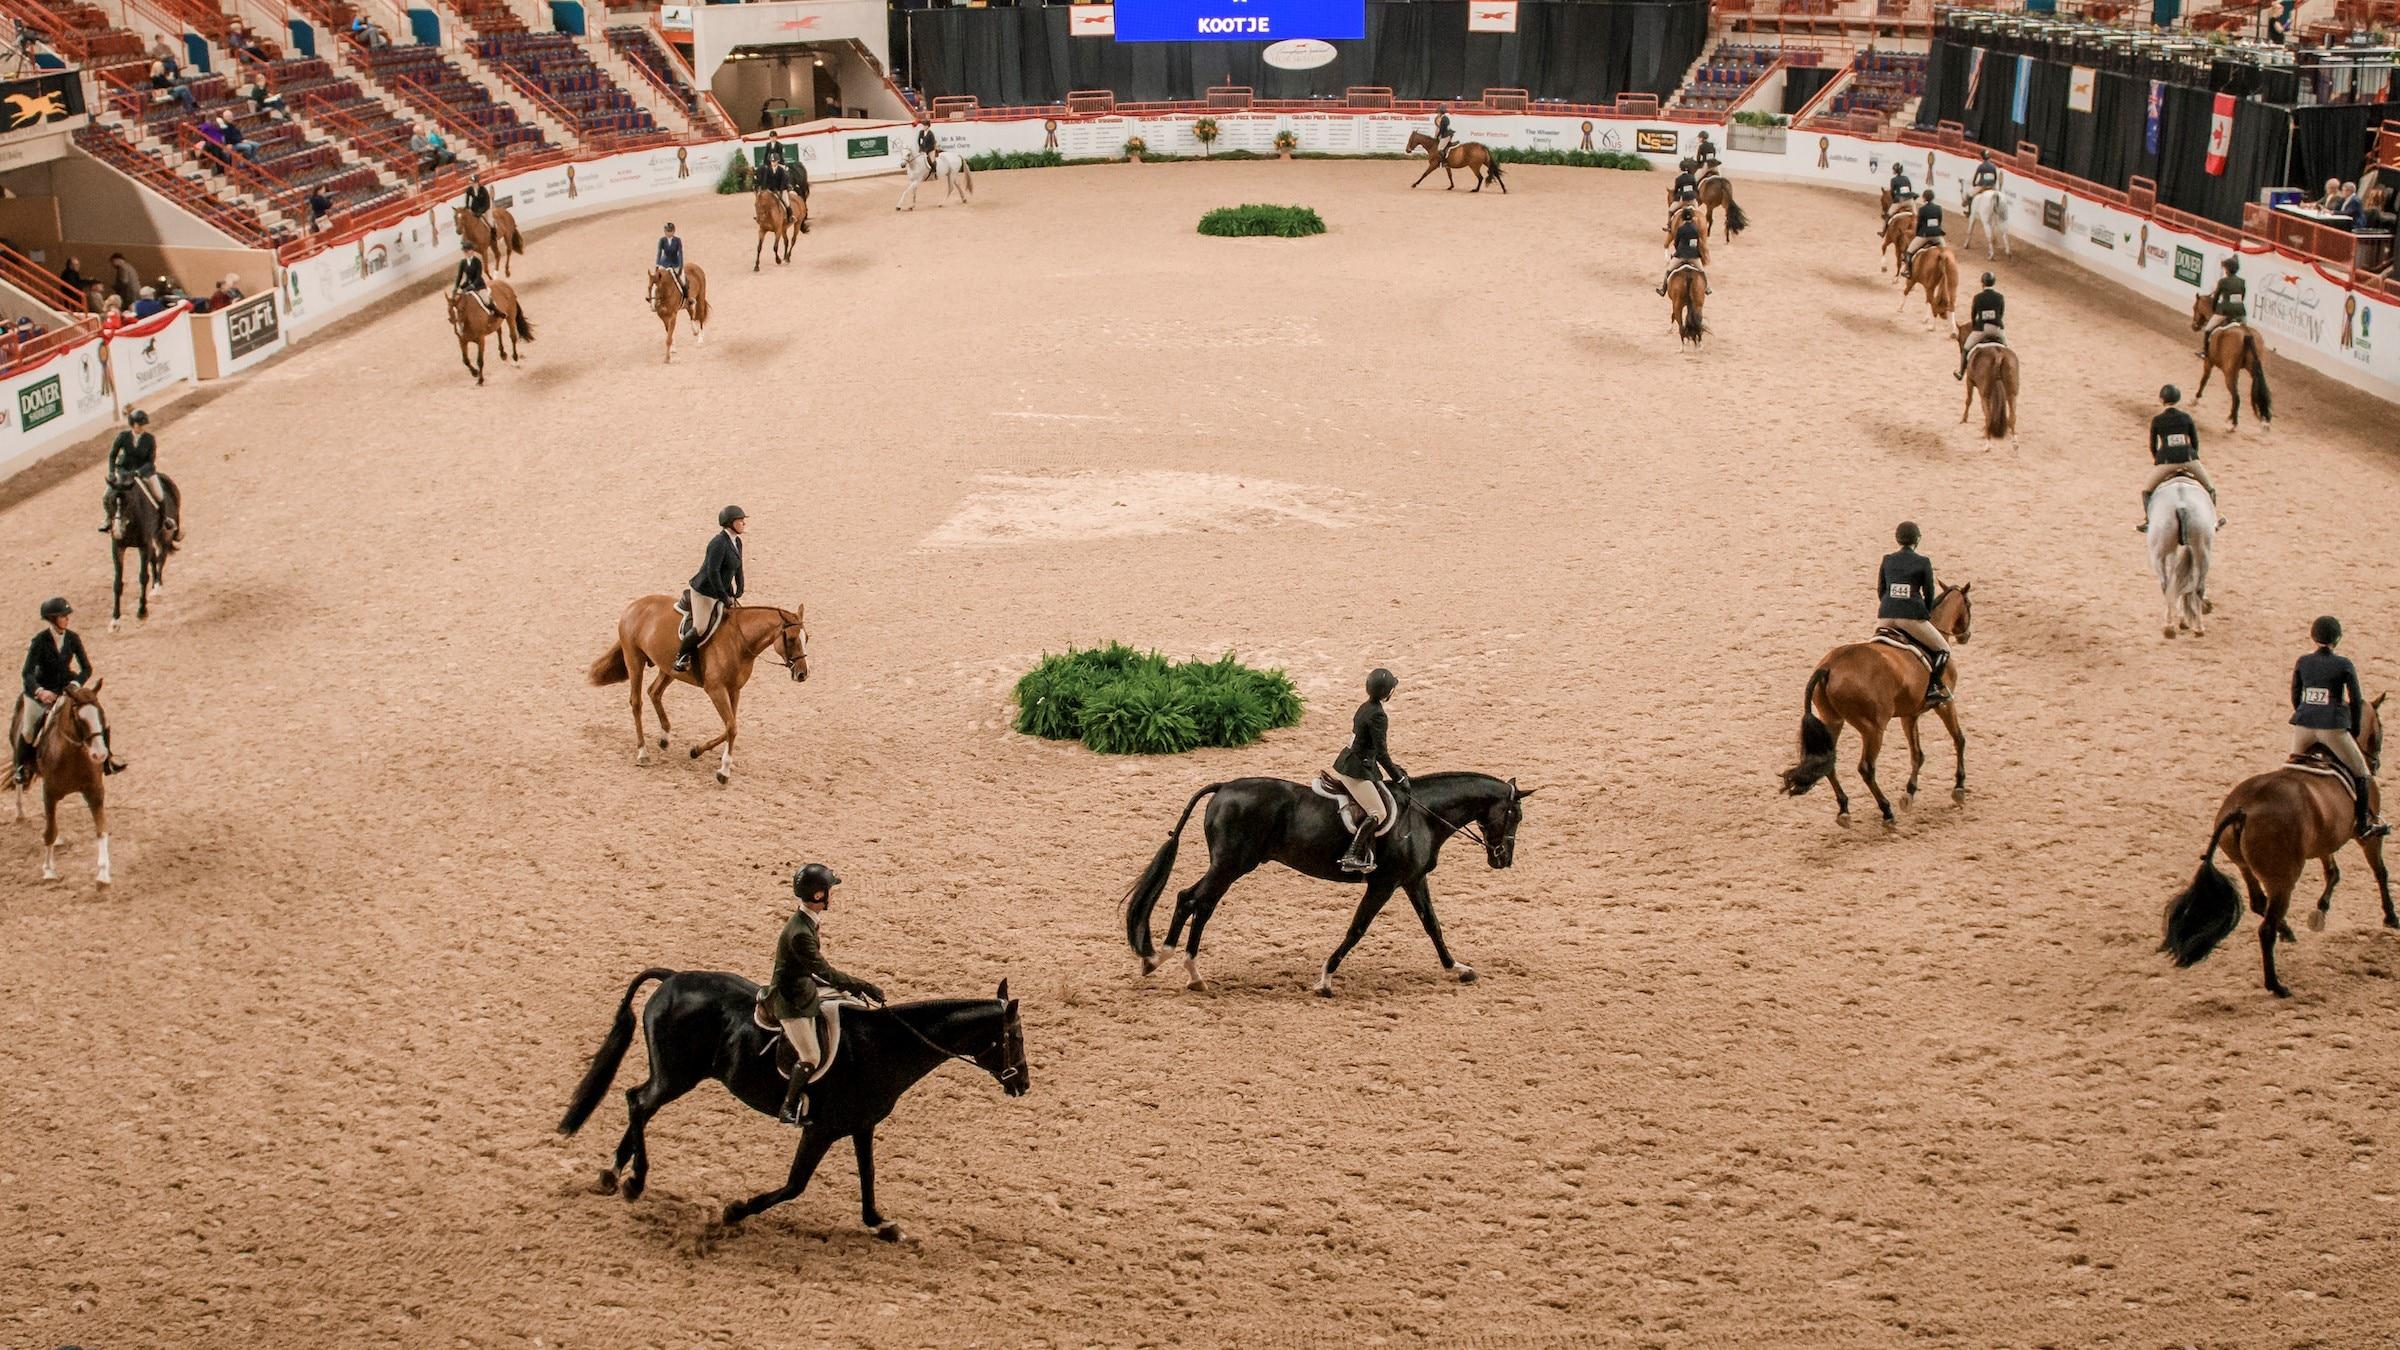 Pennsylvania National Horse Show: Harrisburg Coliseum